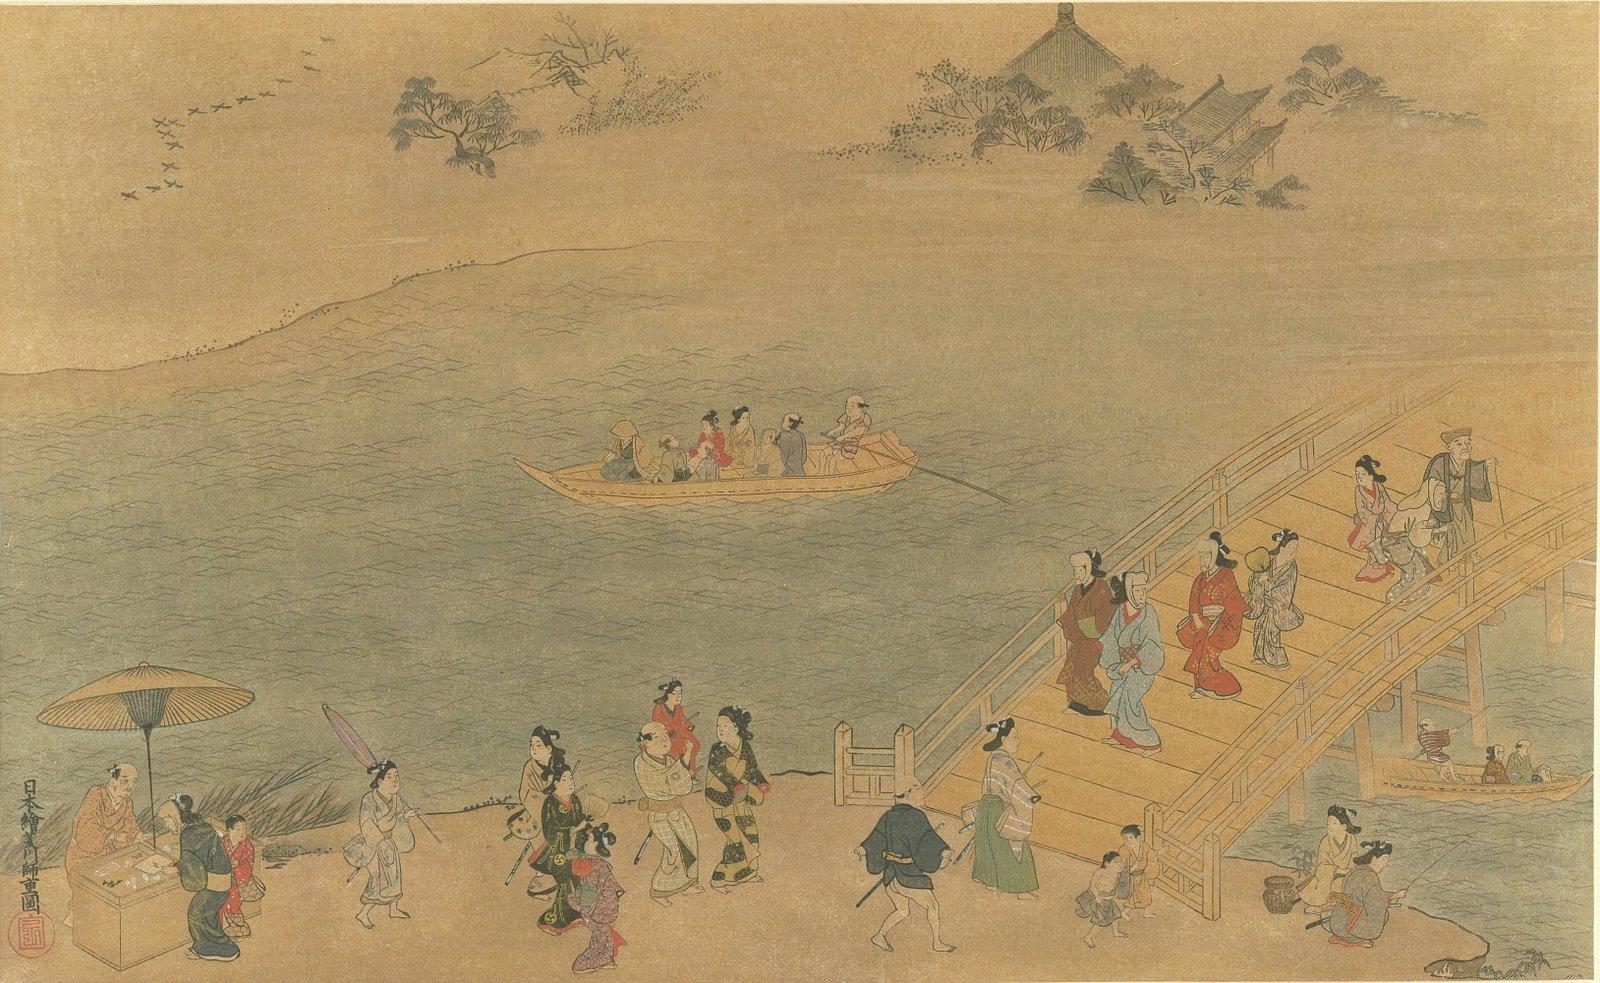 [Ryogoku+Bridge+by+Moroshige+Hishikawa+painting+on+silk+0176-lg.jpg]